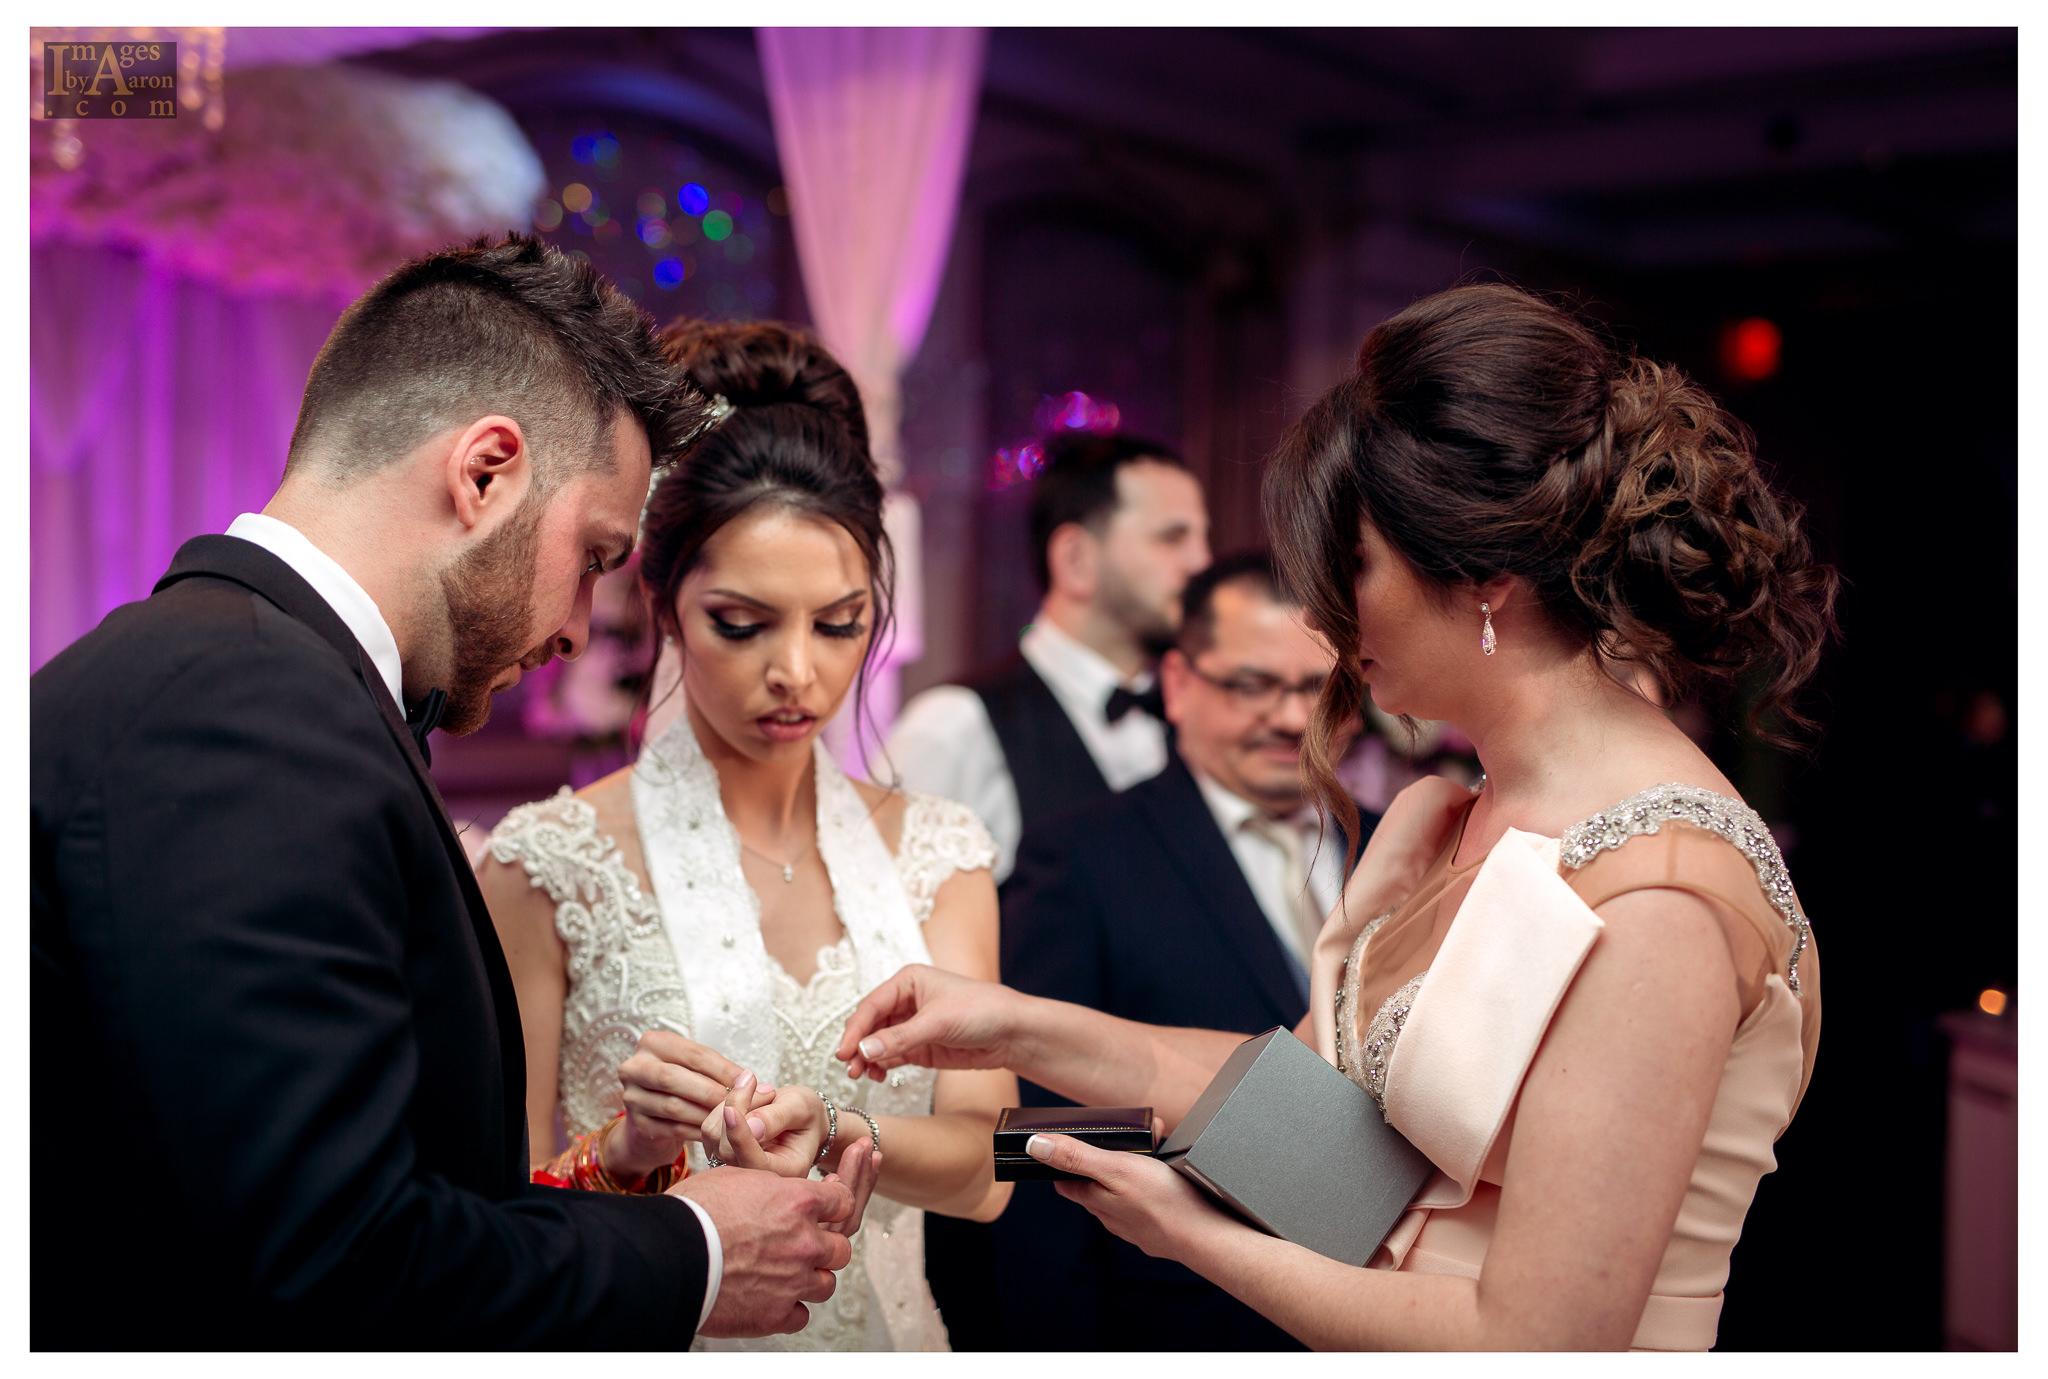 Gokce Turkish Wedding Reception New York Photographer Wedding Photography The Royal Manor-28.jpg